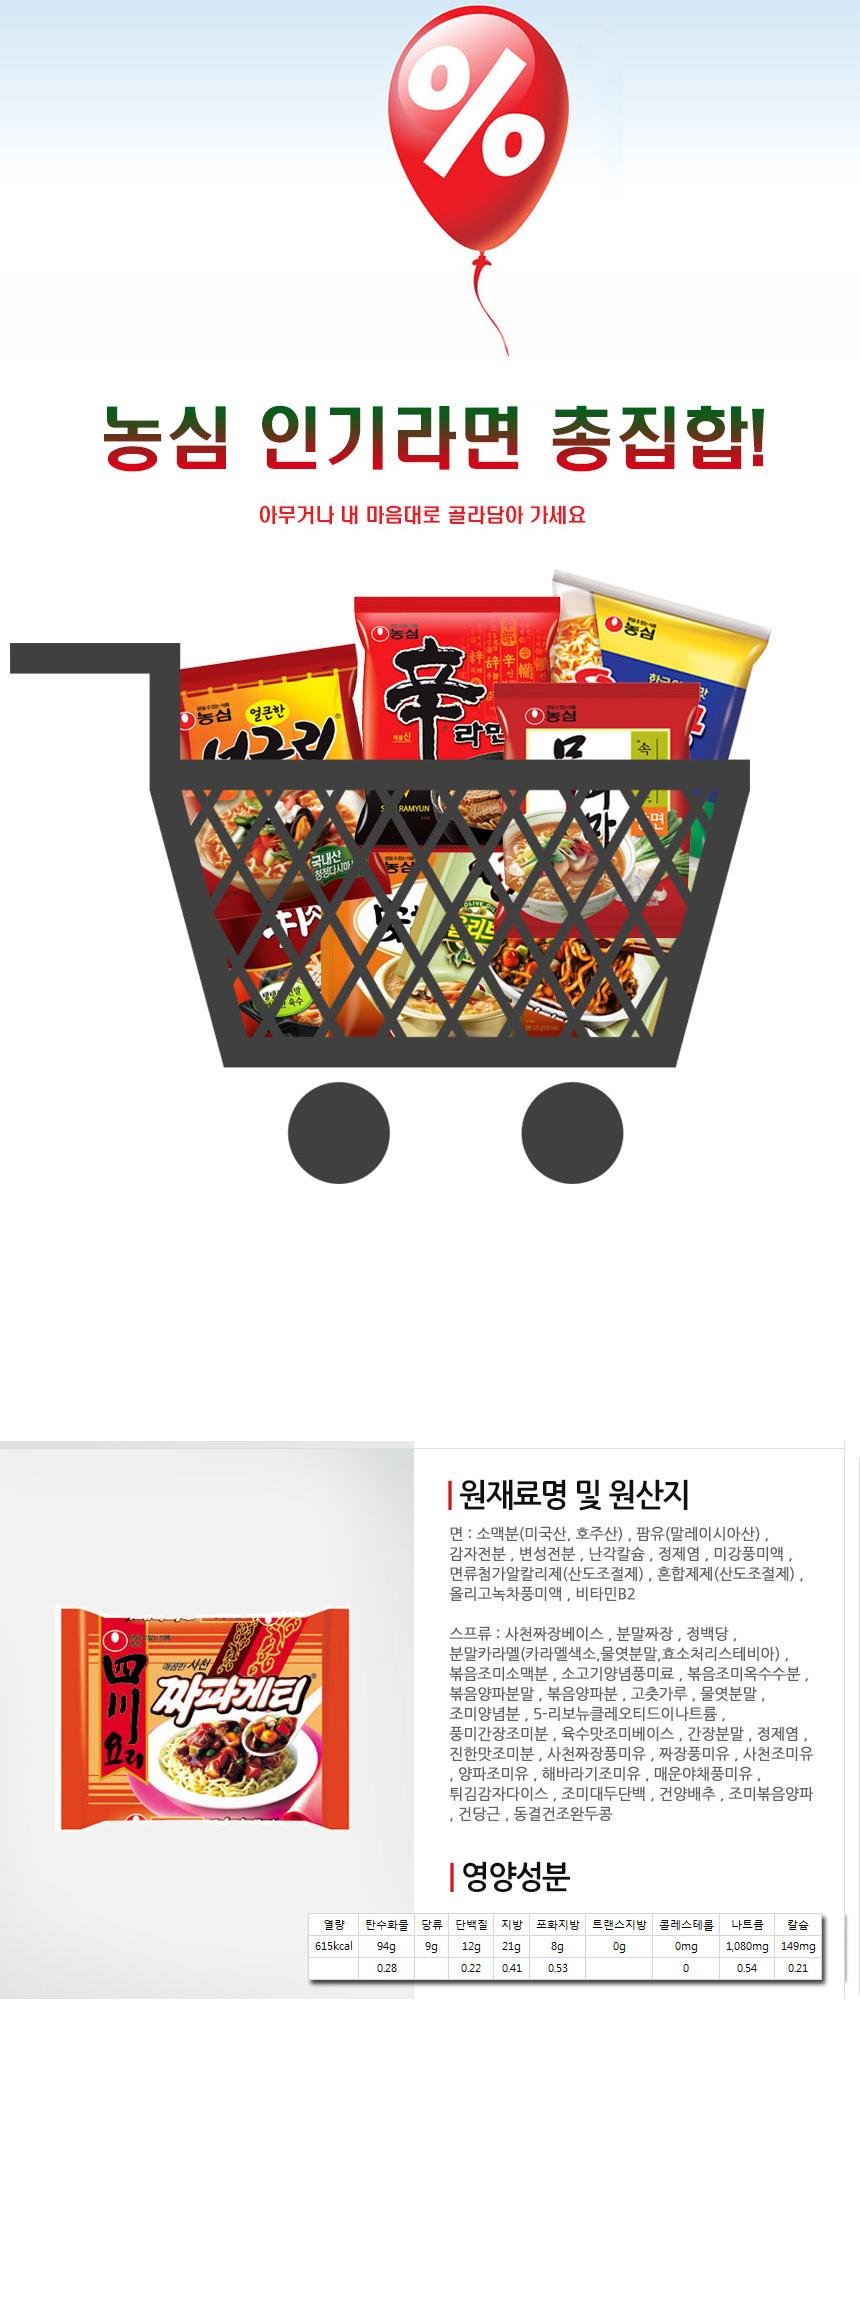 [ NongShim ] Sichuan DishChapagetti137g x 5P